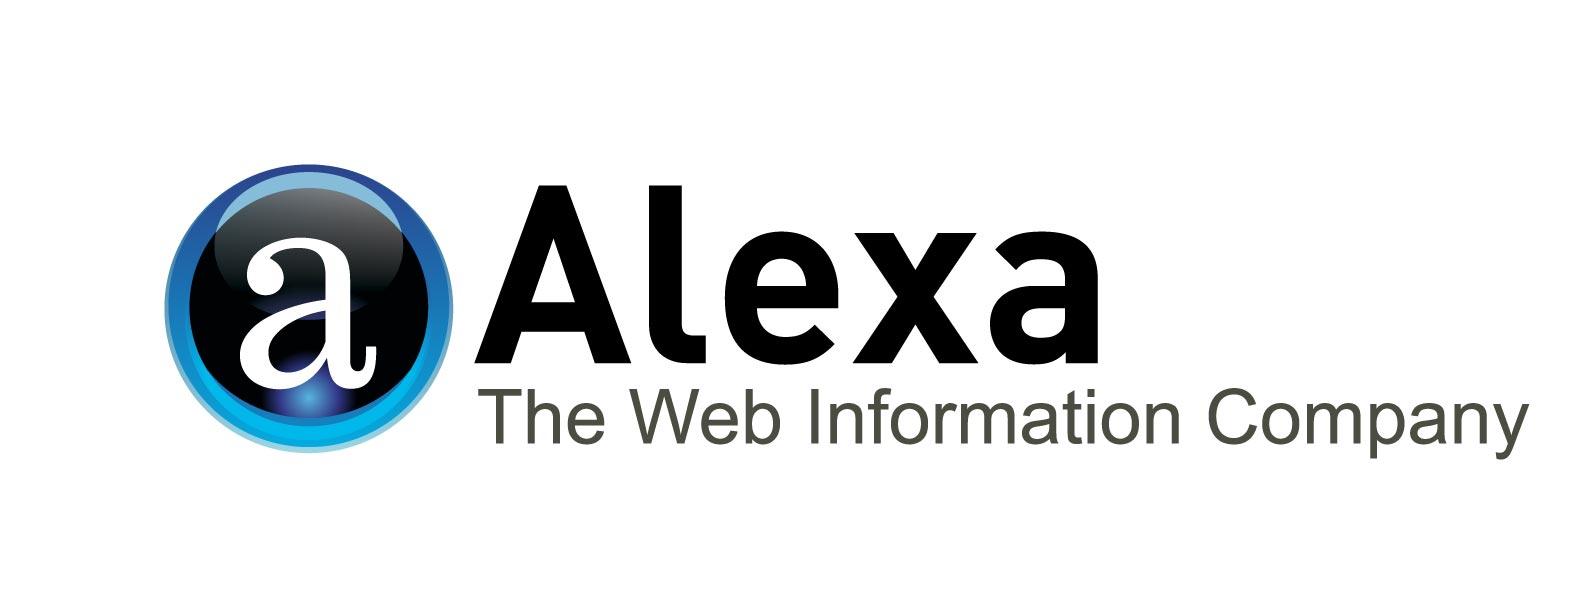 Chỉ số alexa